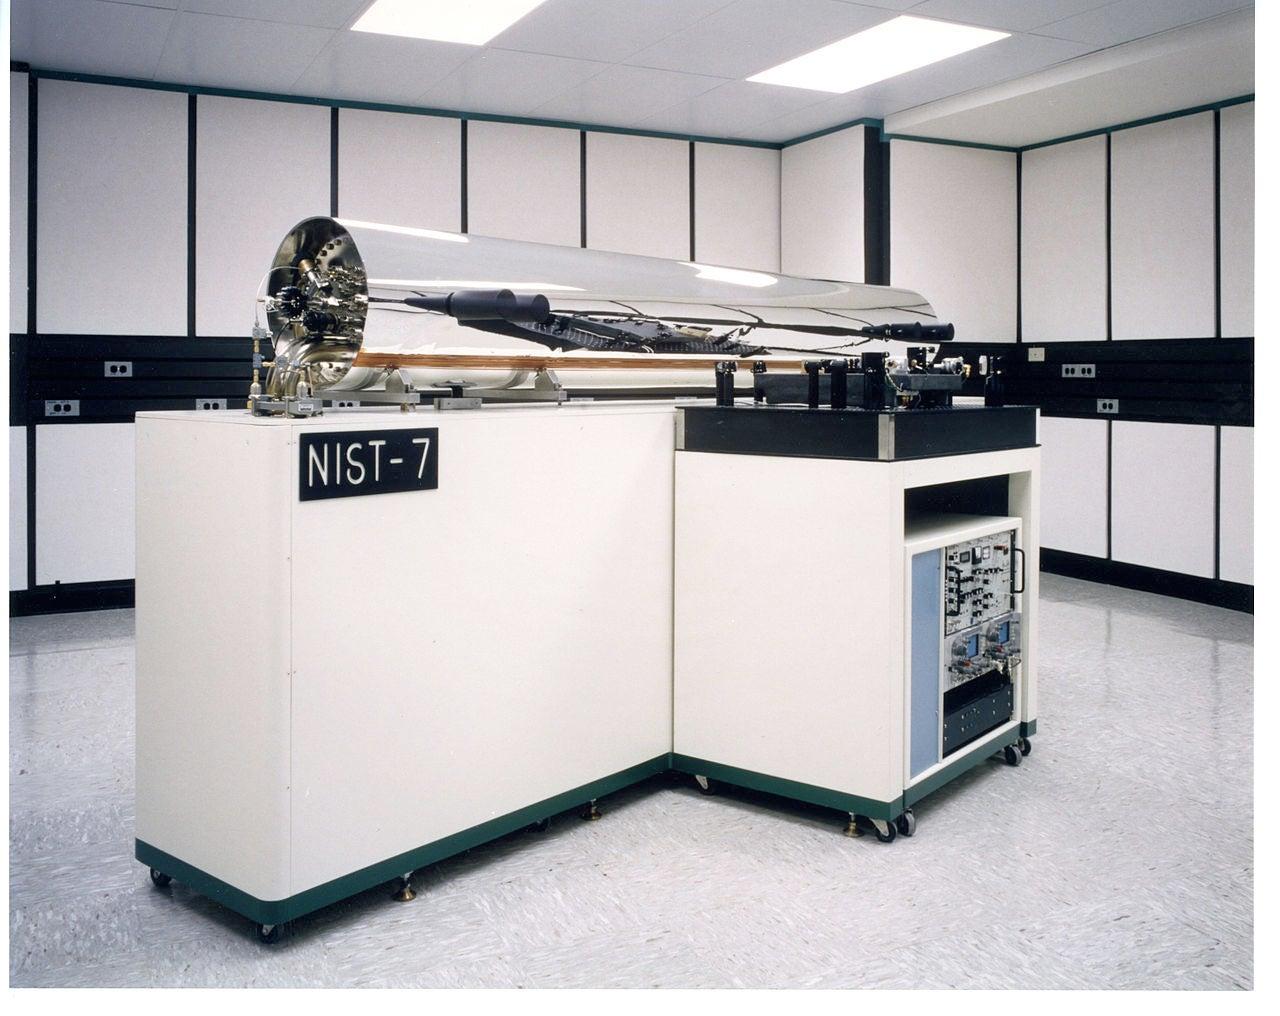 DARPA Wants Long-Lasting Super-Precise Portable Atomic Clocks